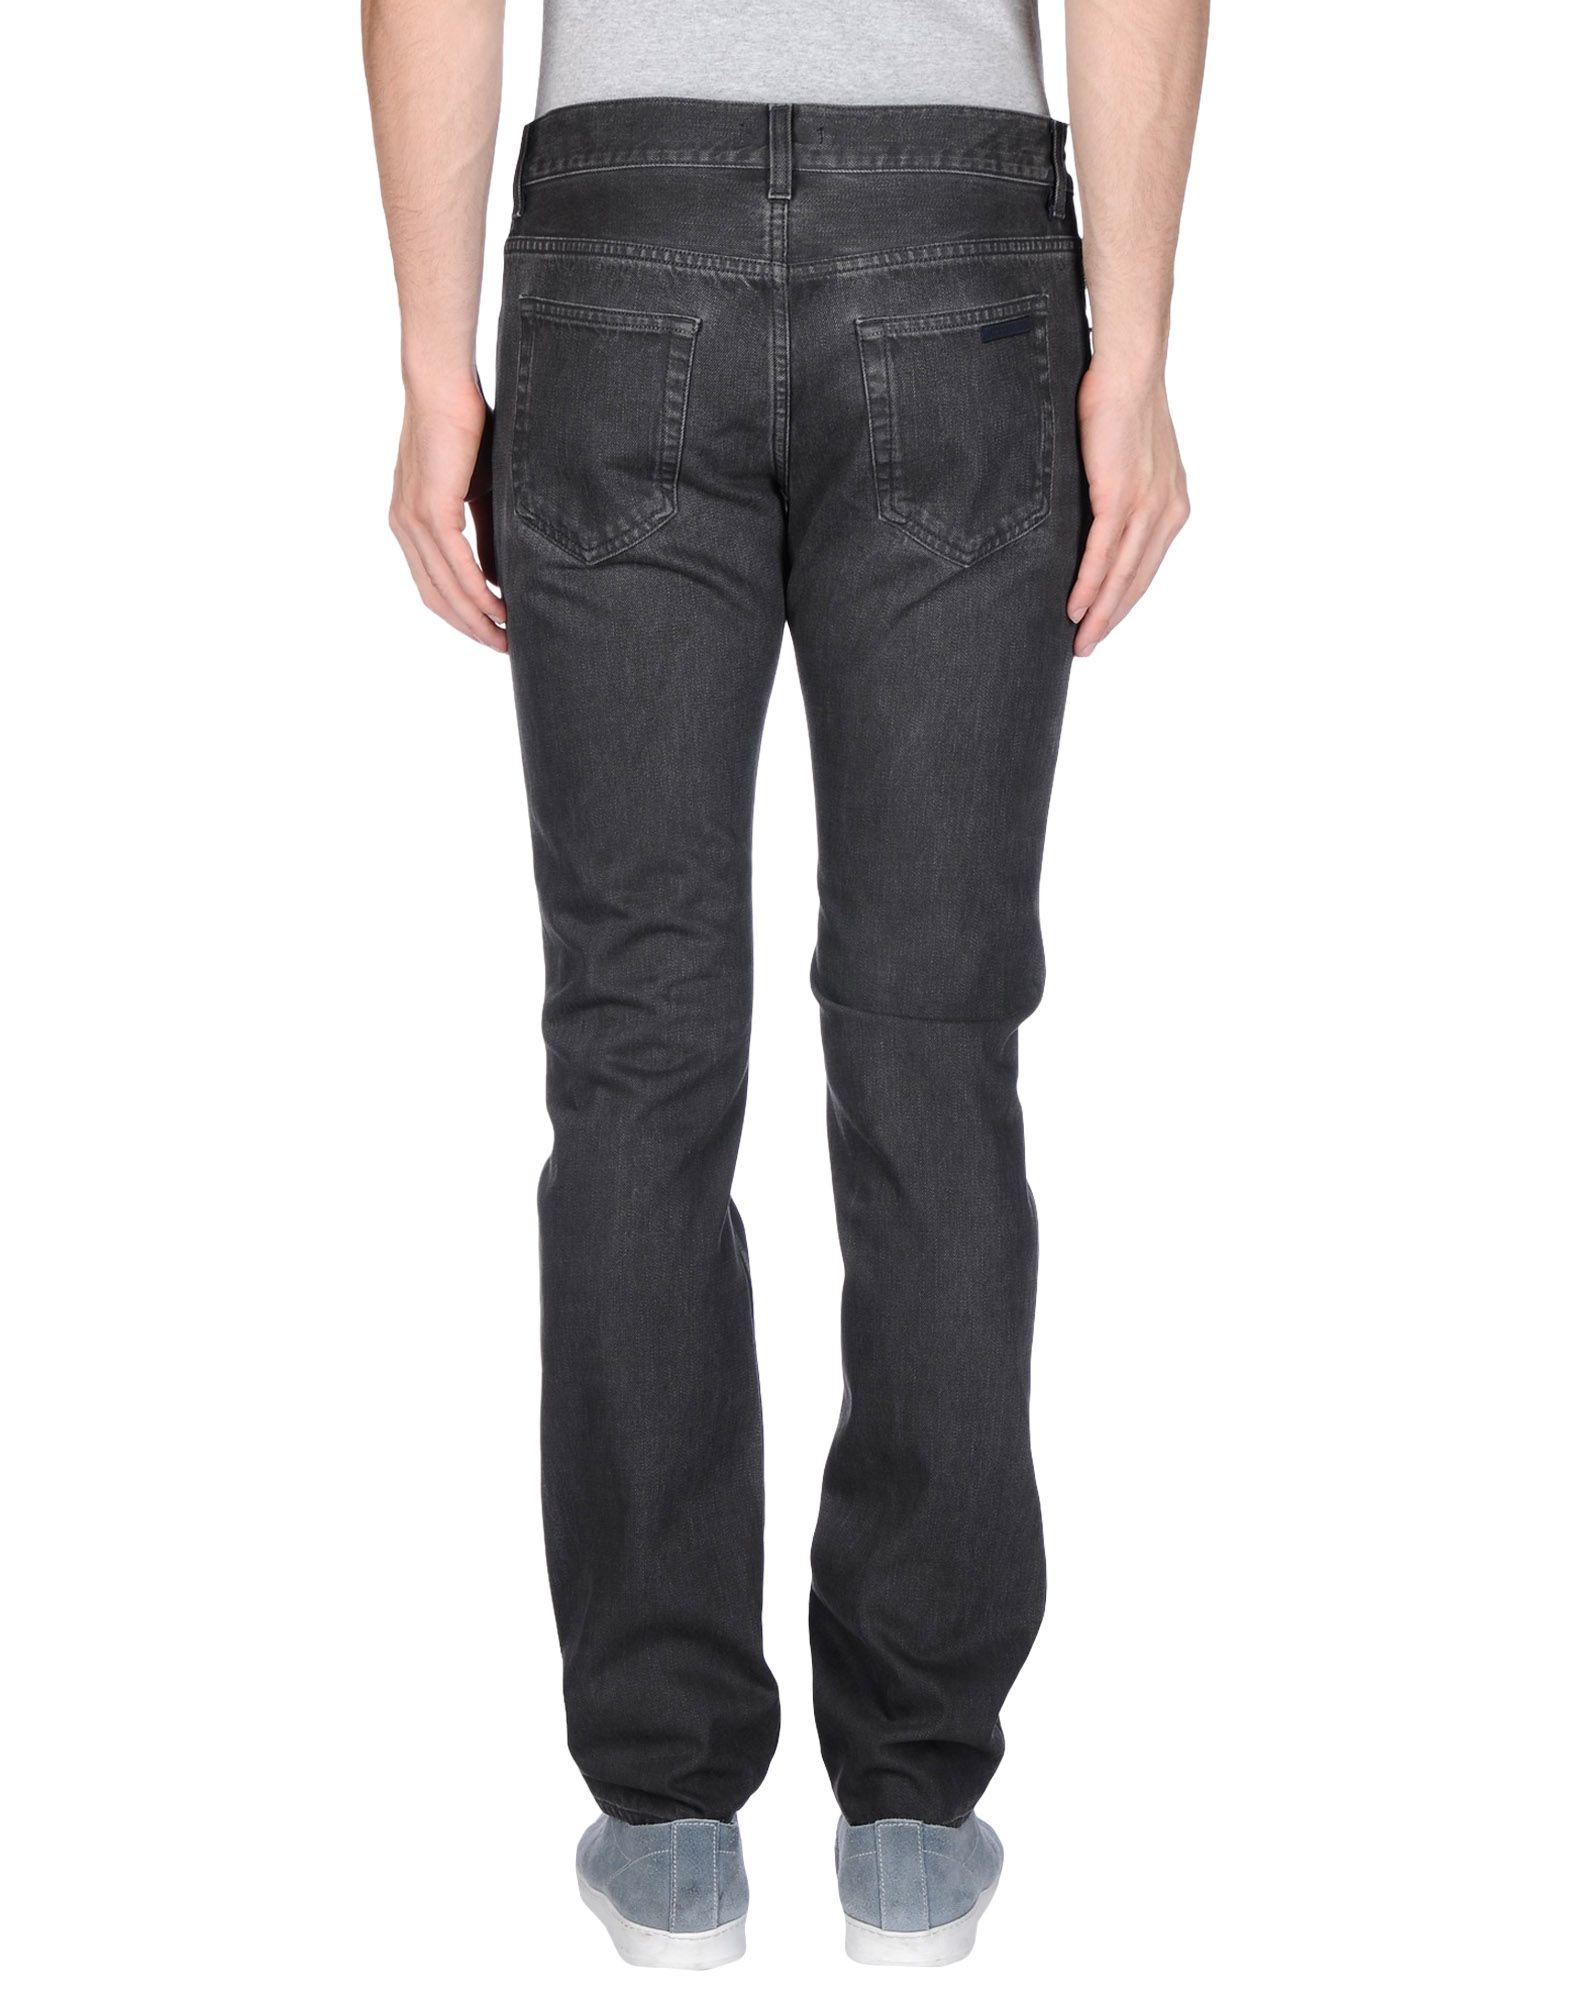 Men\u0026#39;s Prada Jeans | Lyst?